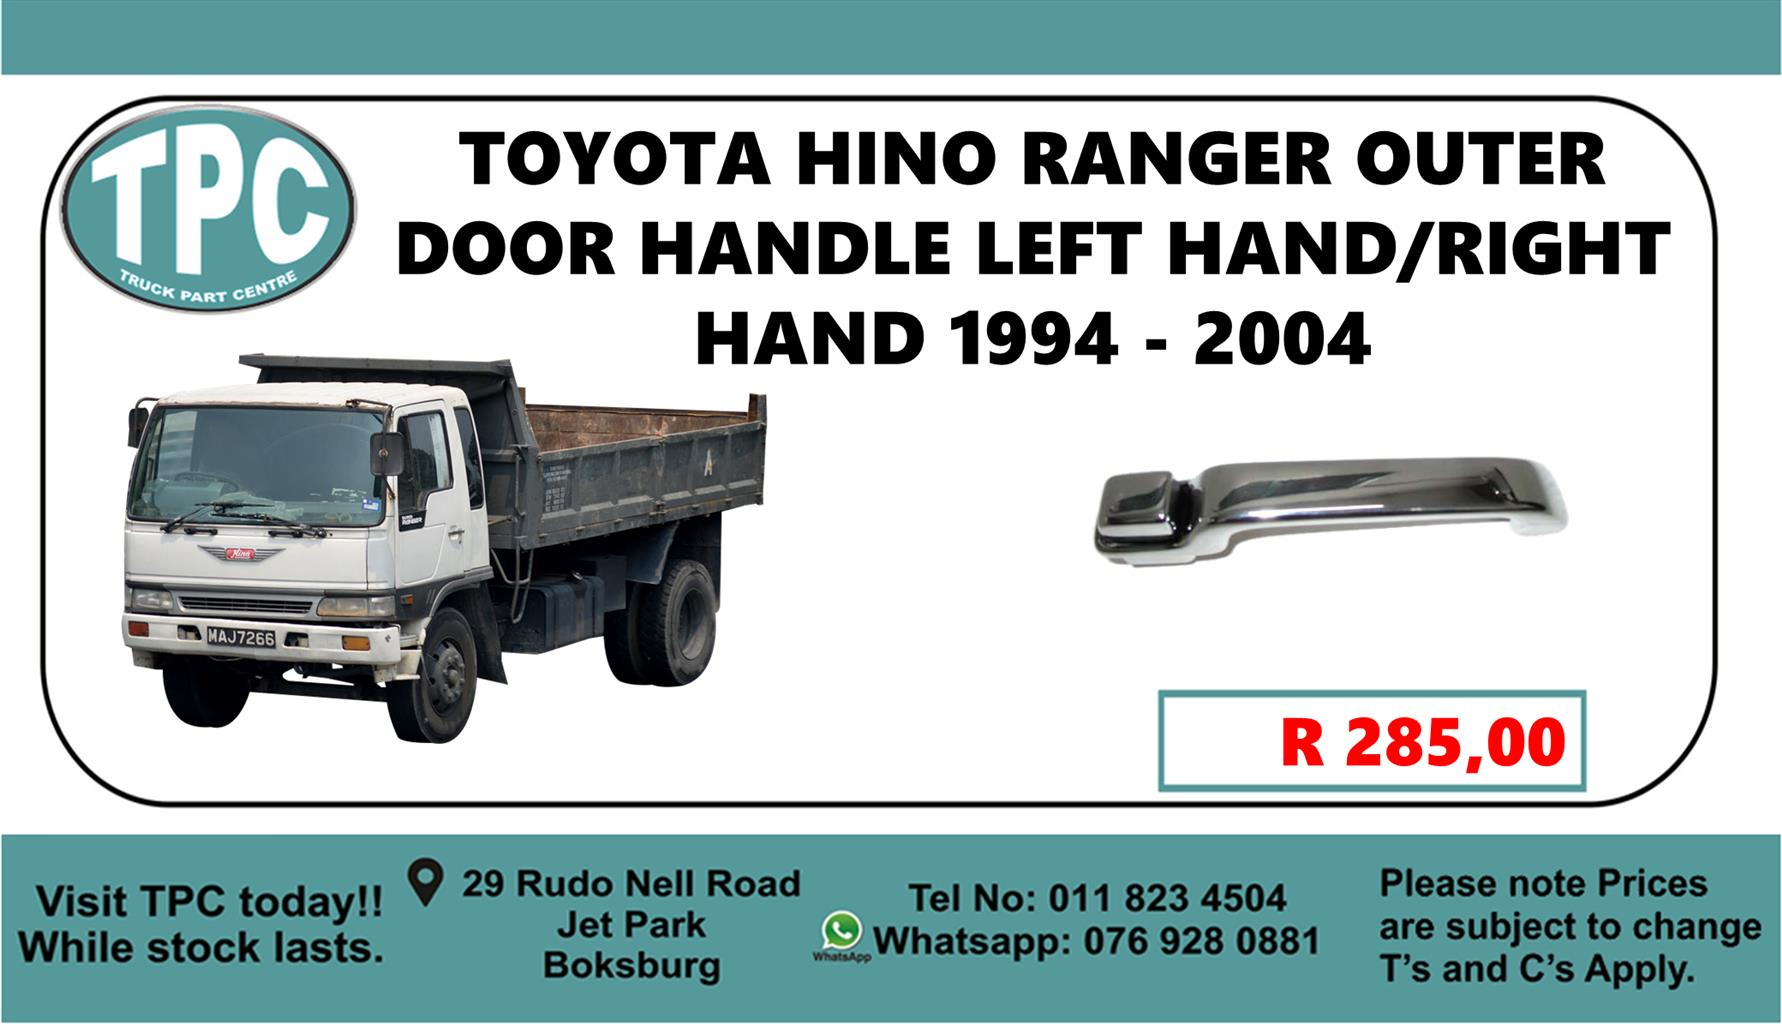 Toyota HINO Ranger Outer Door Handle Left Hand/Right Hand 1994 - 2004